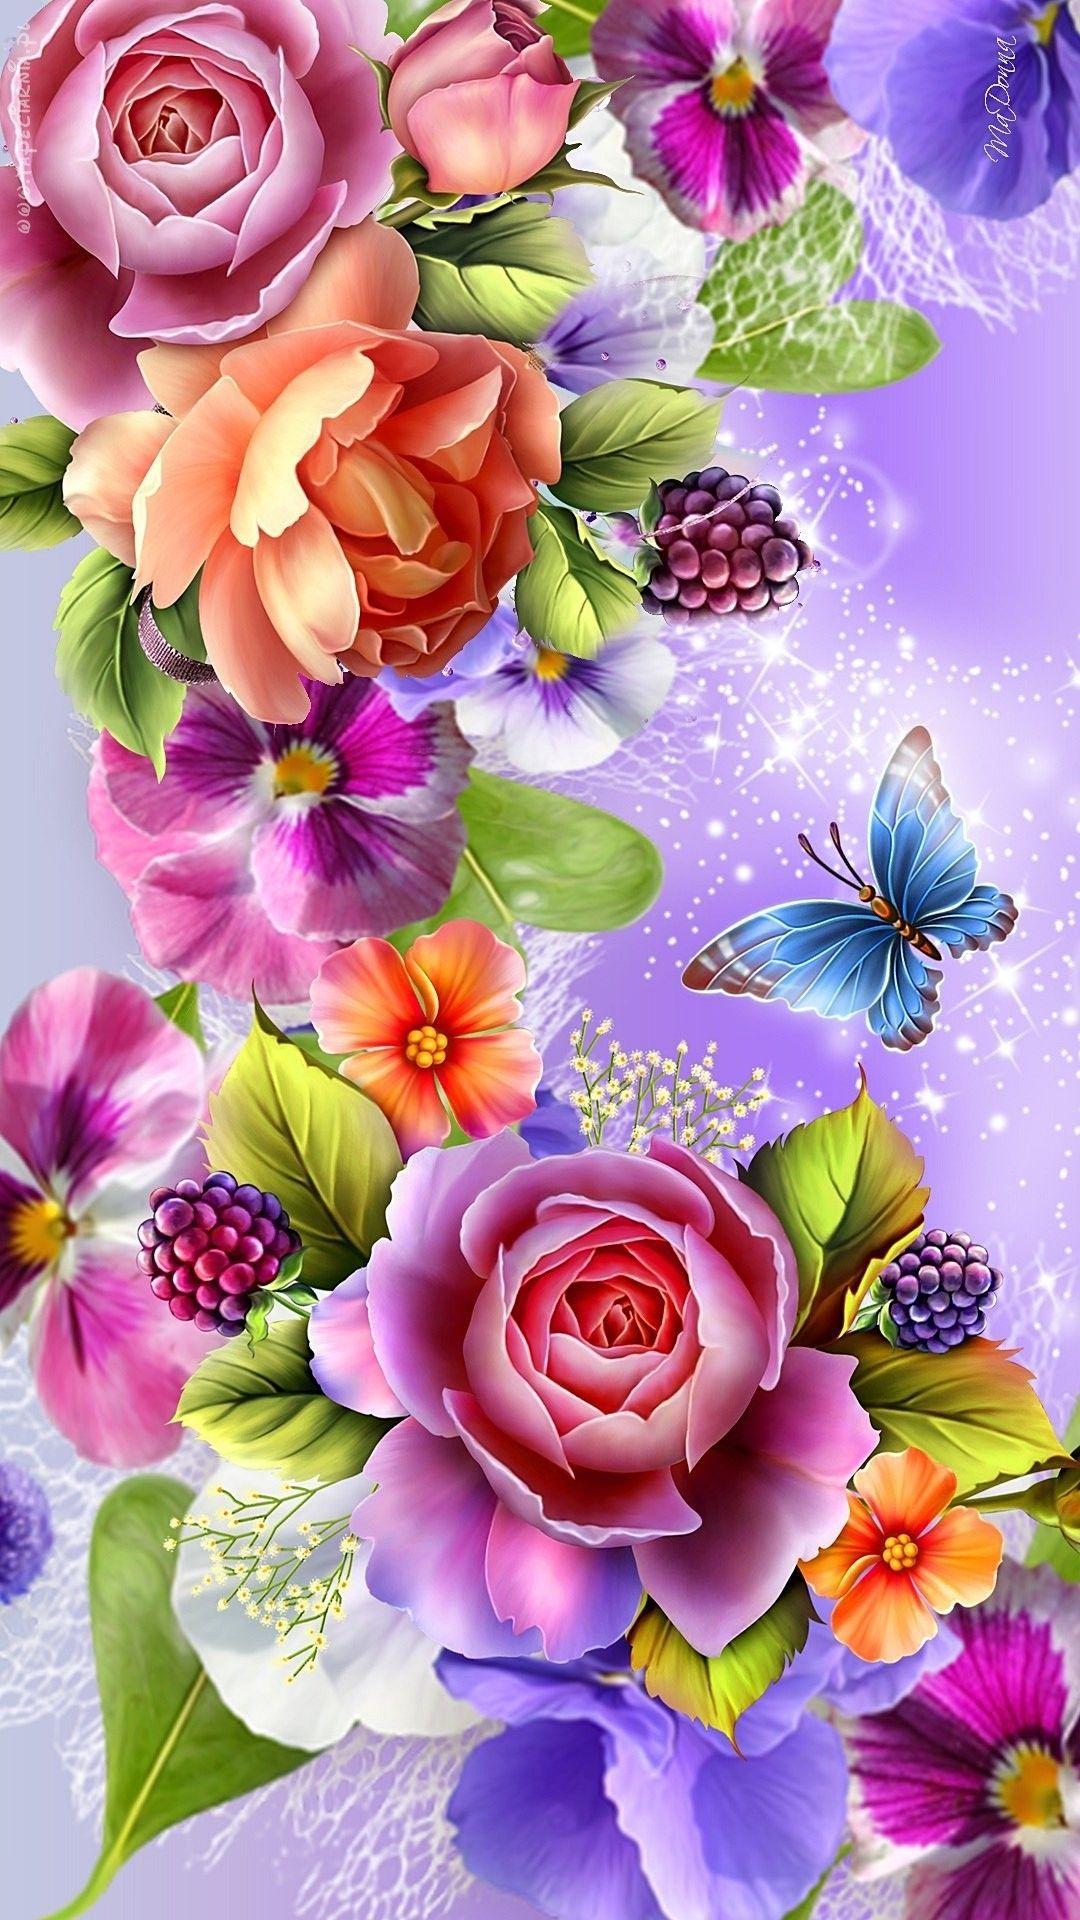 Fantastic Colorful Art Flowers Wallpaper By Artist Un Fantasztikus Szines Art Viragok Wallpaper In 2020 Flower Art Flower Painting Flower Phone Wallpaper Fantastic photo flower wallpaper photo